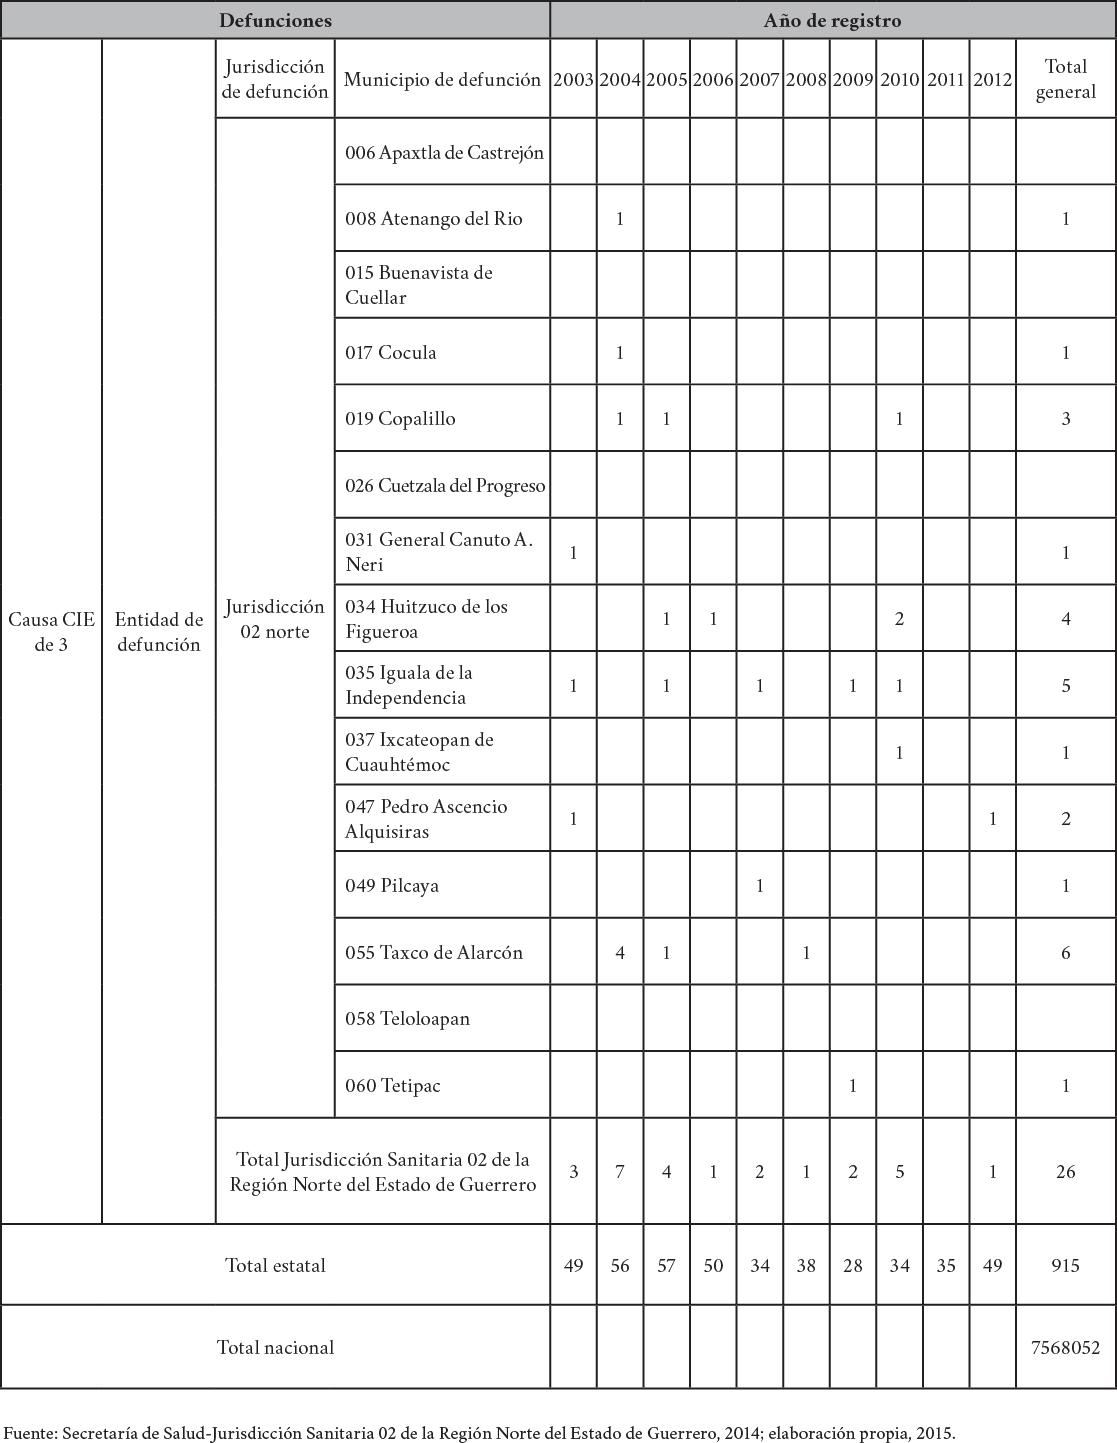 geodialacmexb59-c2